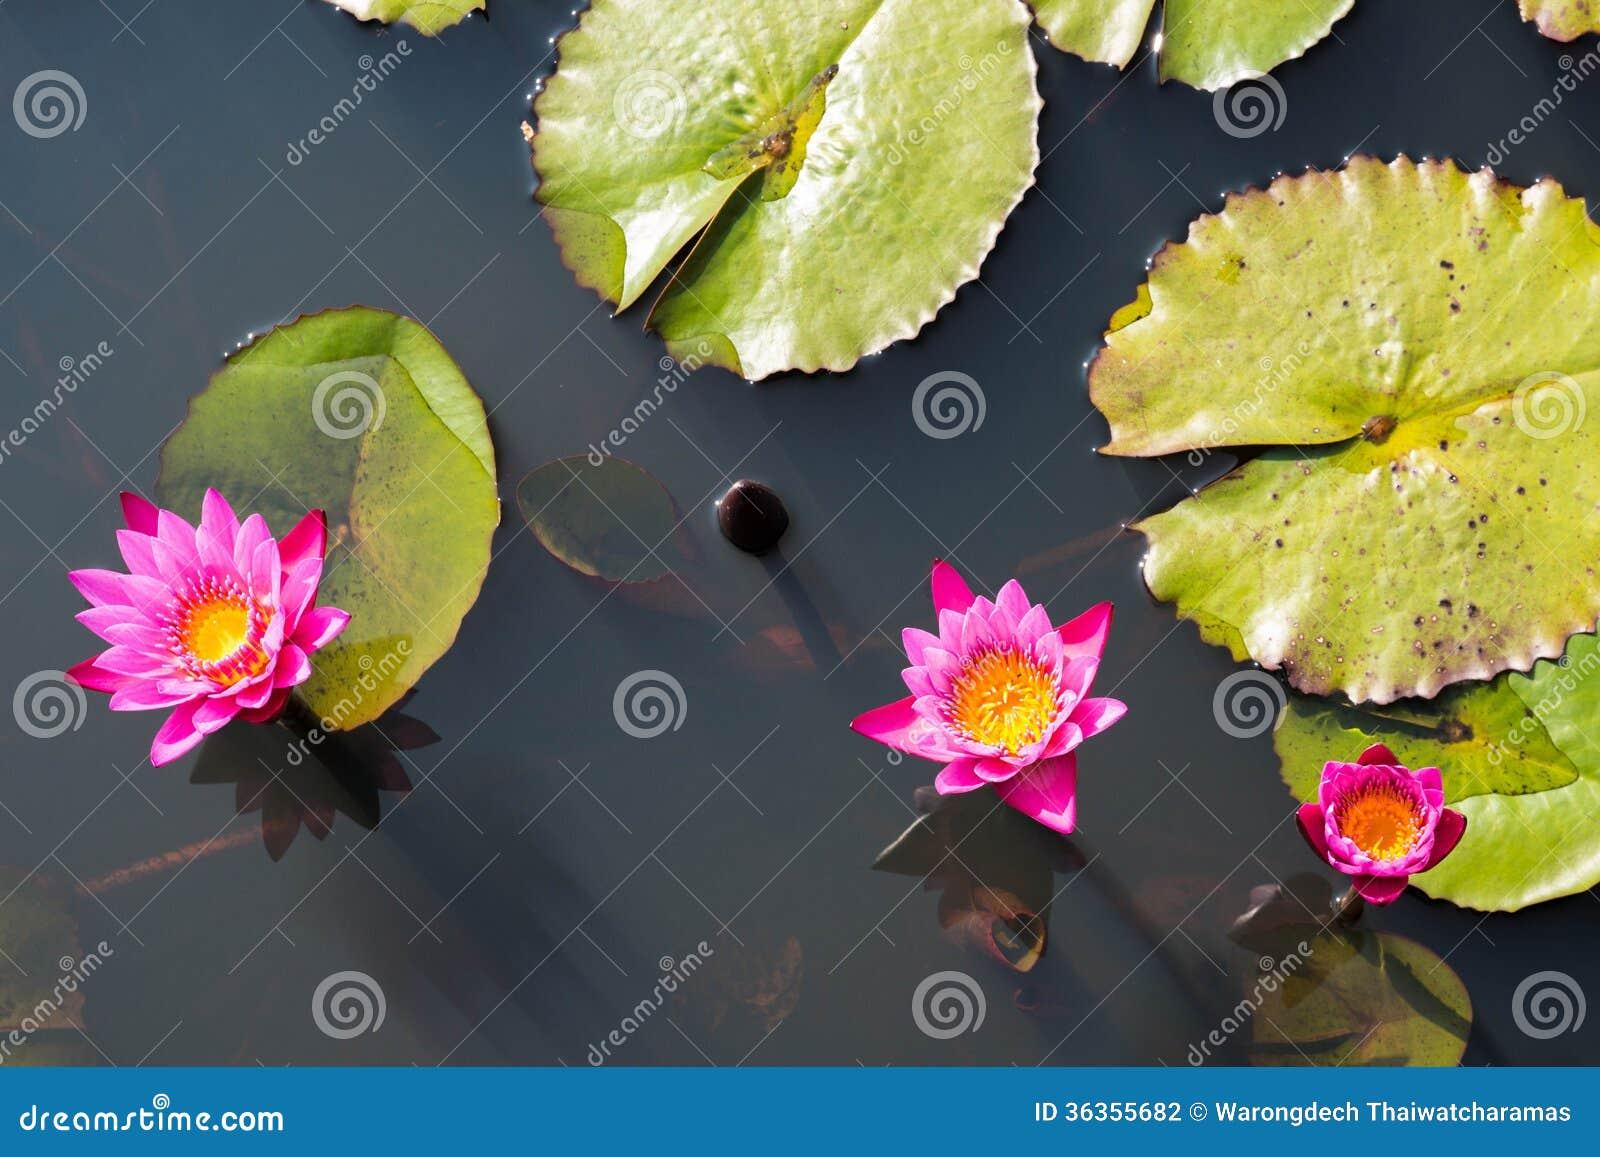 Lotus Flower In Buddhism Stock Photo Image Of Botanical 36355682